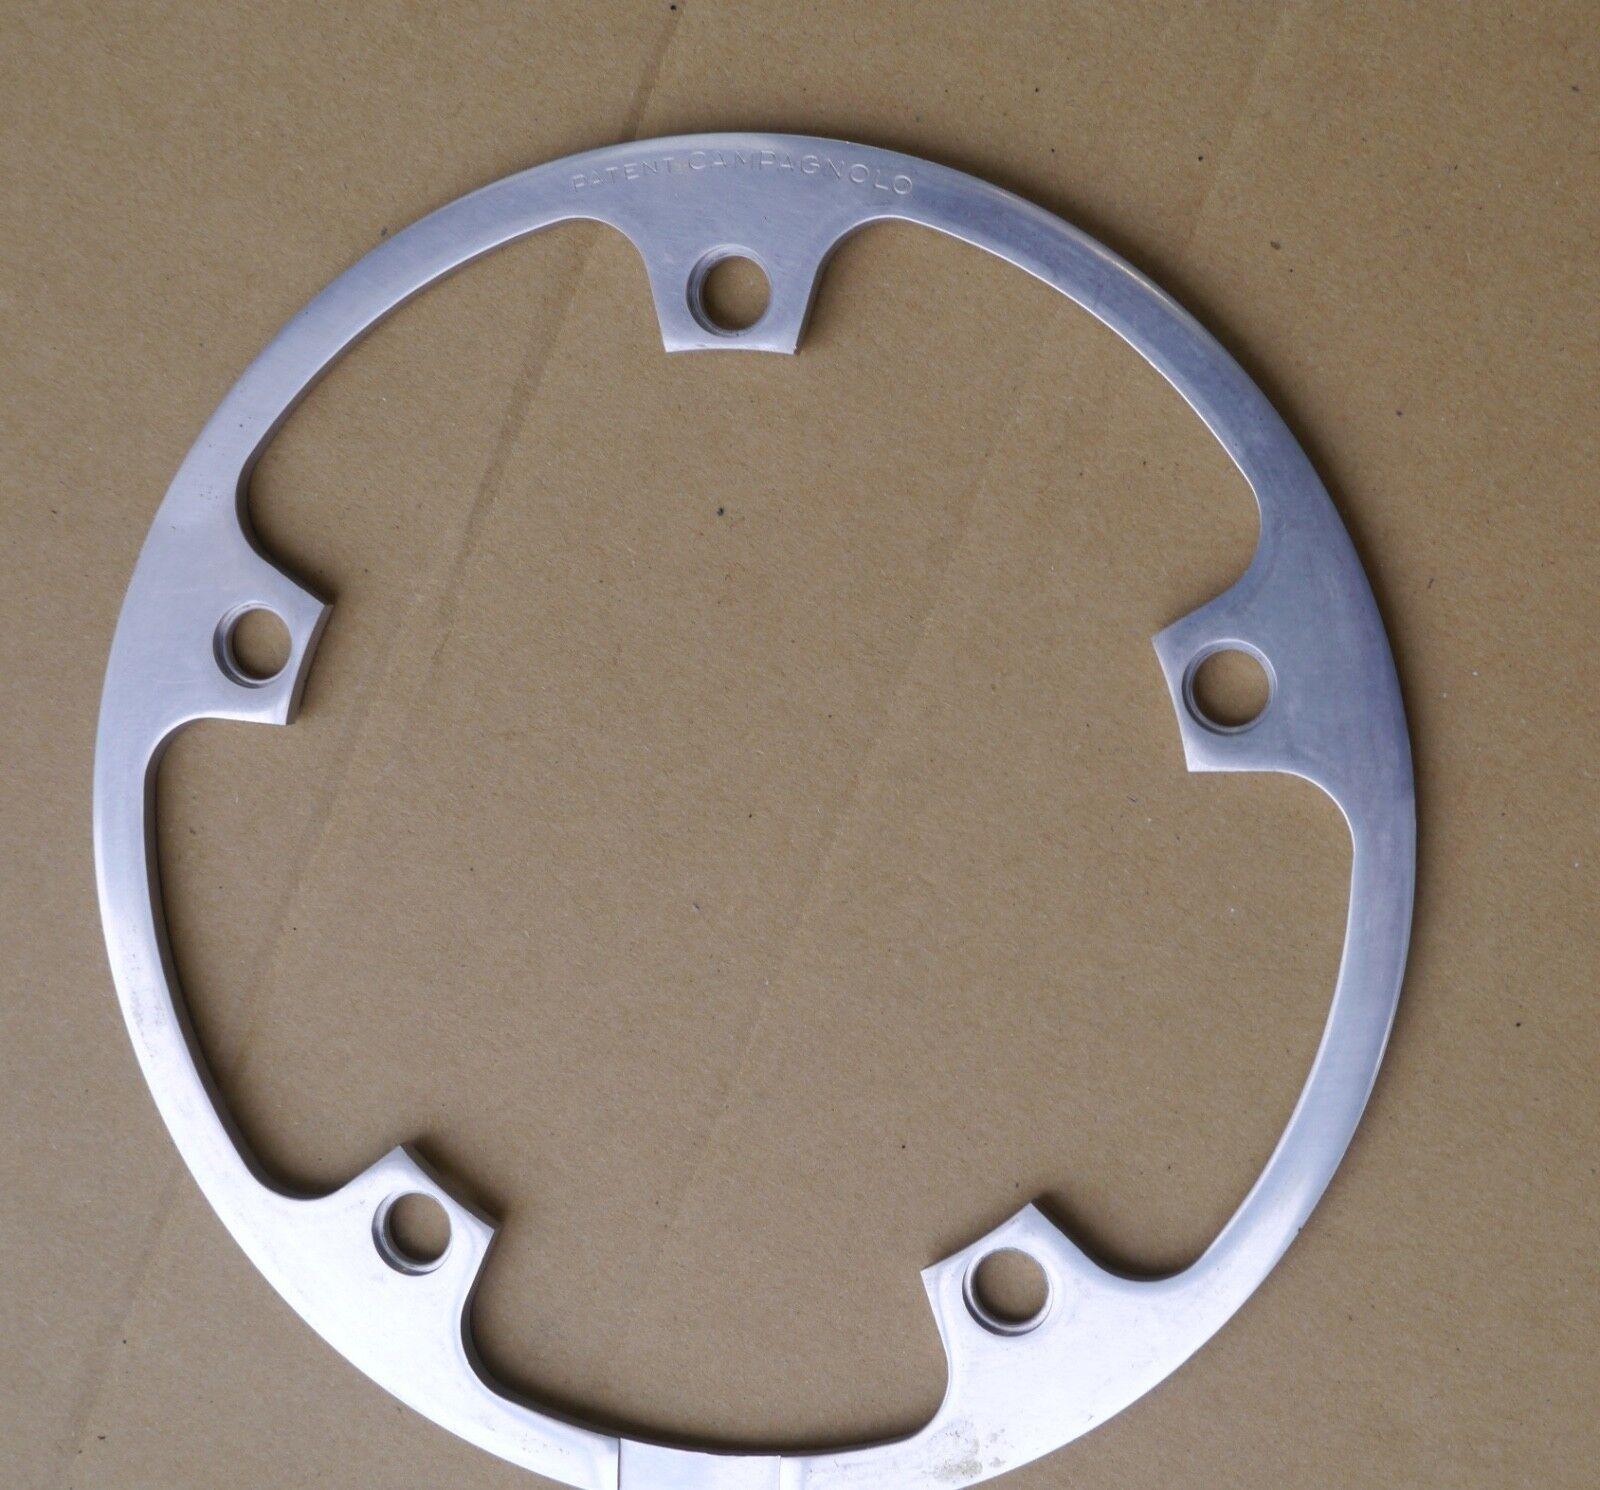 NOS Campagnolo aluminium crankset chain guard, 185 mm, 5 holes 144 Bcd